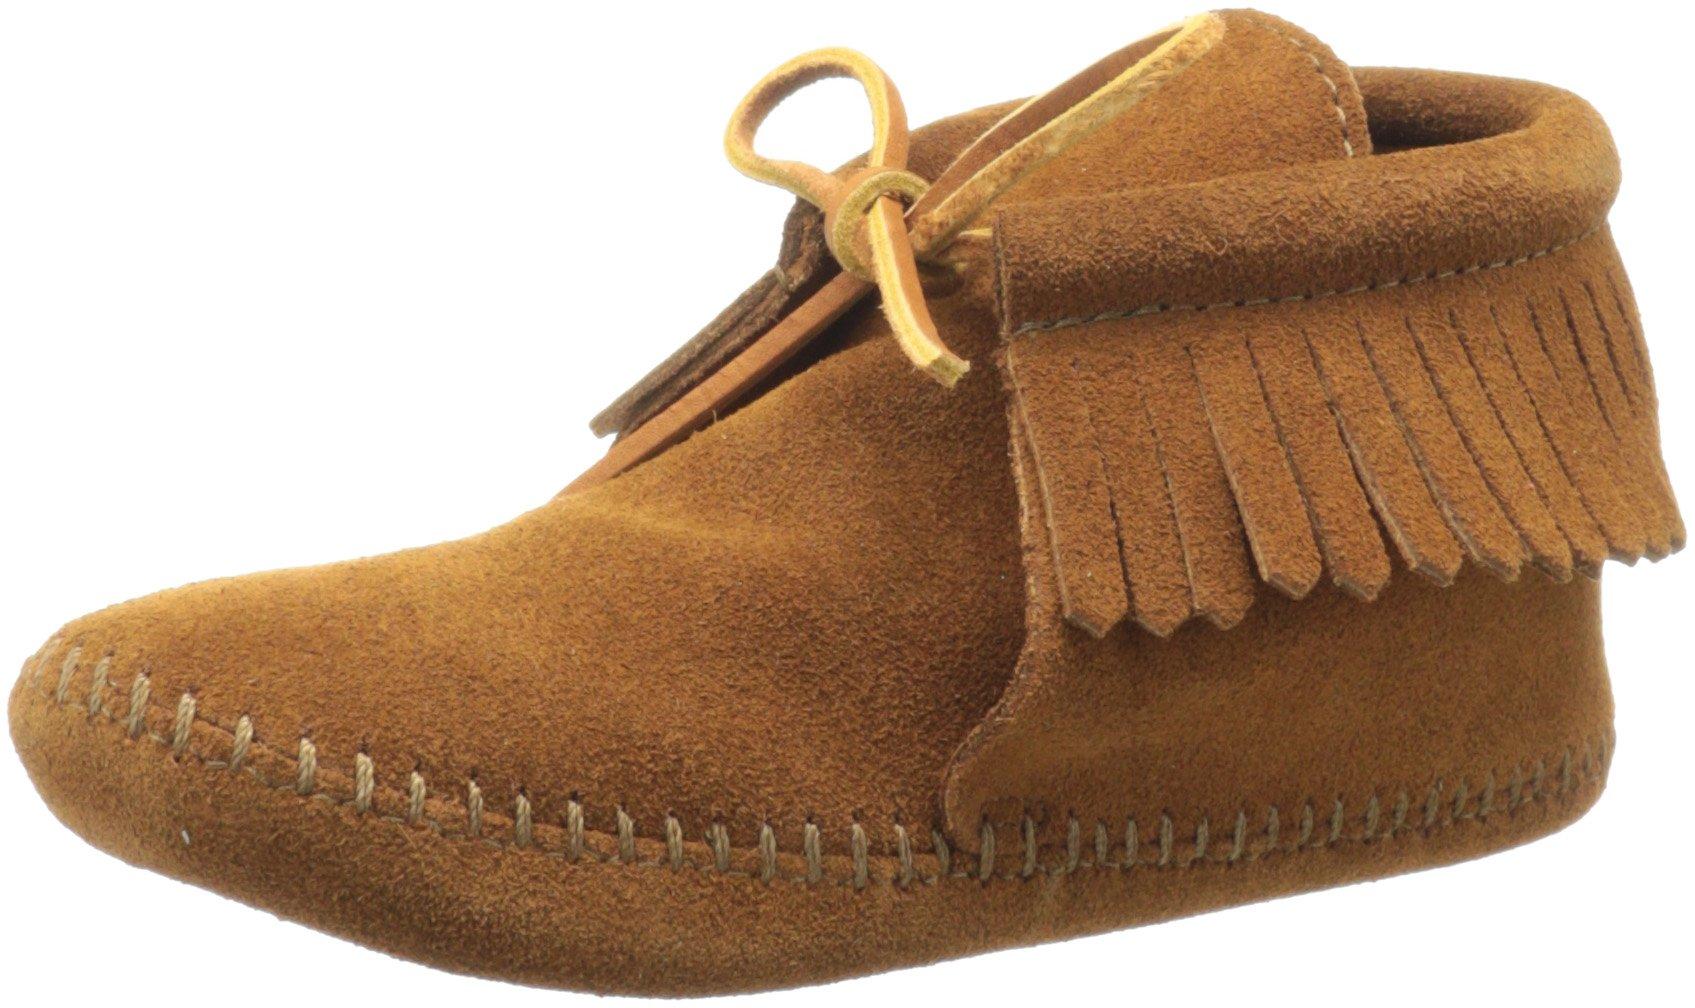 Minnetonka Classic Fringe Softsole Boot (Toddler/Little Kid/Big Kid),Brown,9 M US Toddler